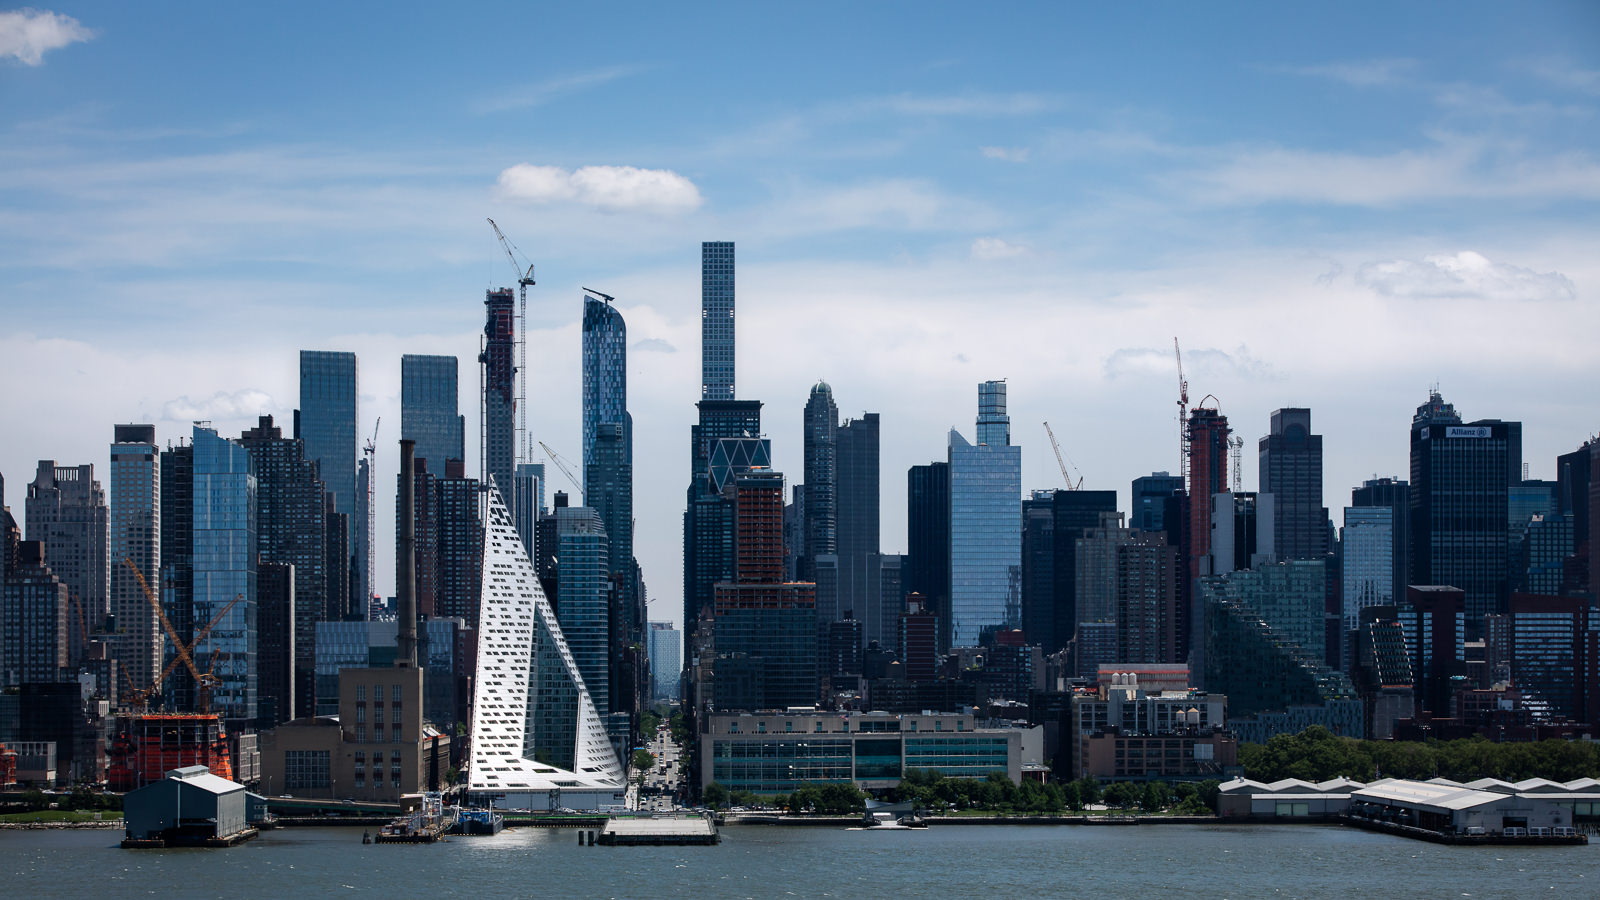 VIA 57 WEST, New York City, NY - Bjarke Ingels Group